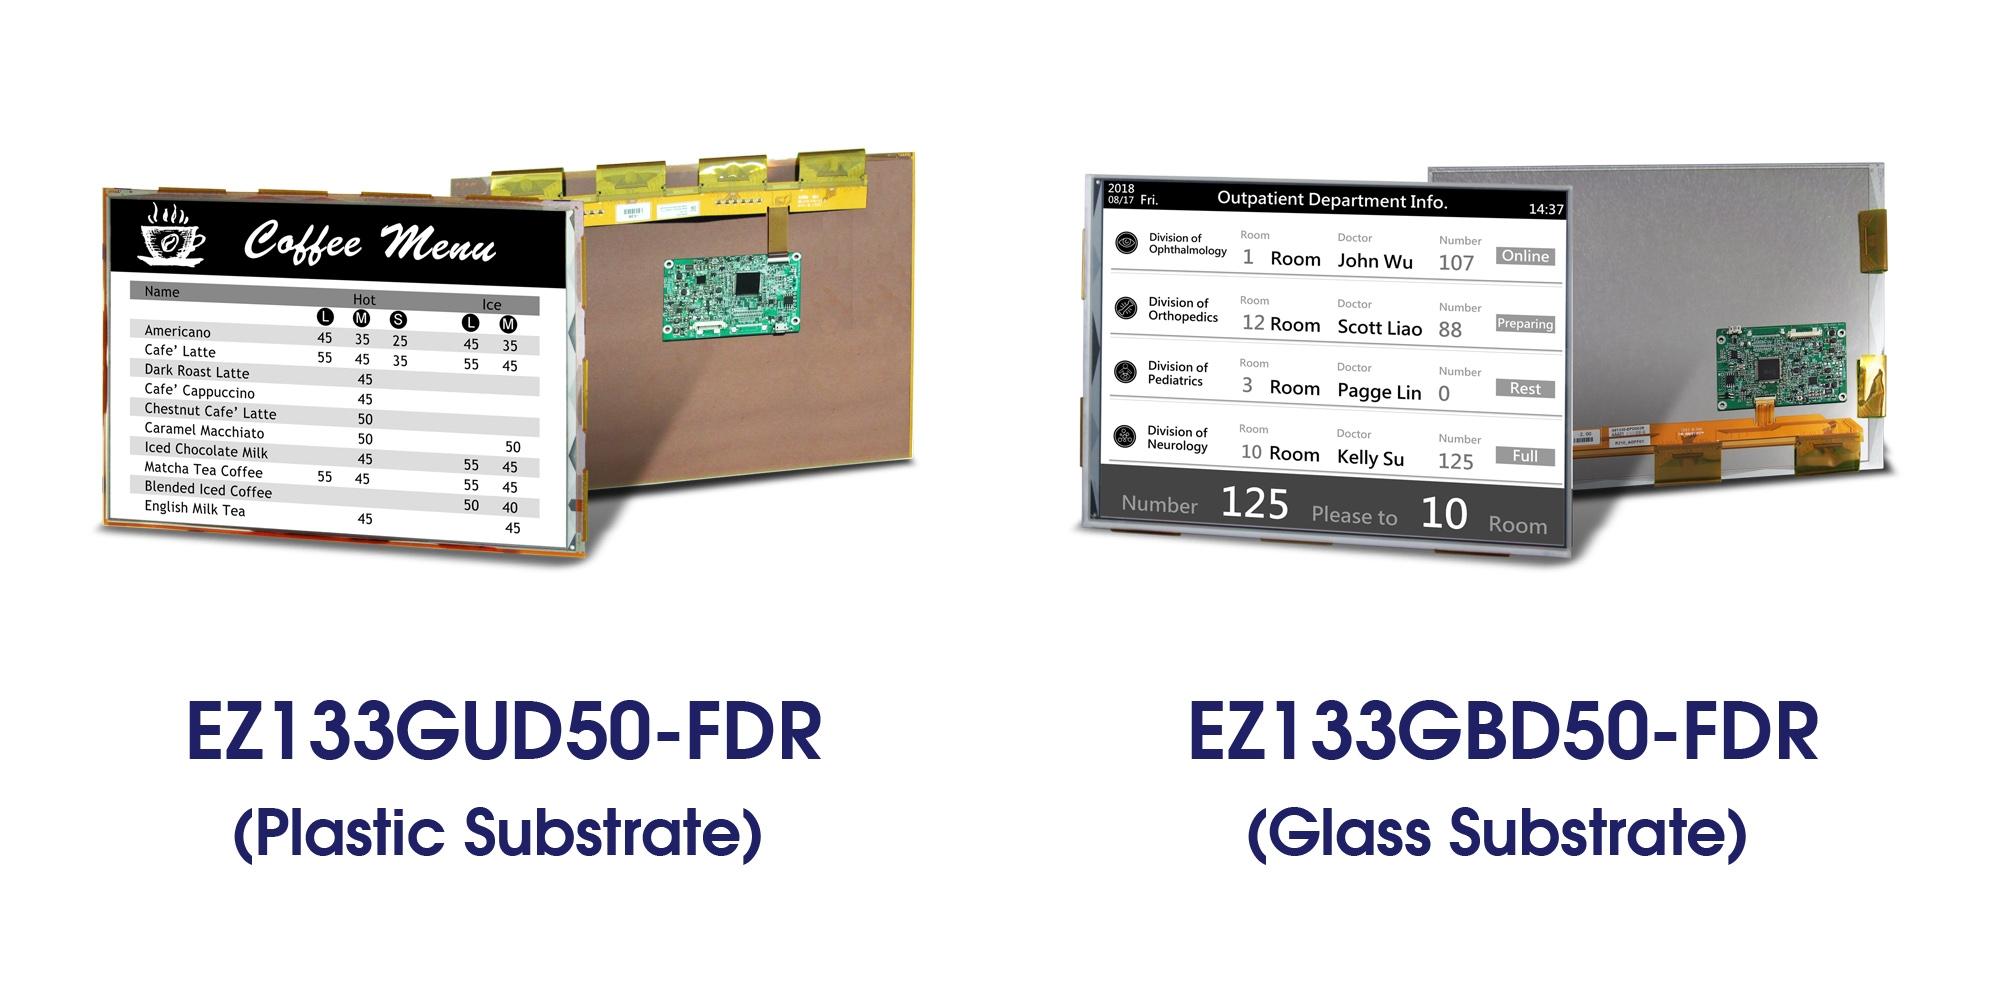 EZ133GUD50-FDR EZ133GBD50-FDR